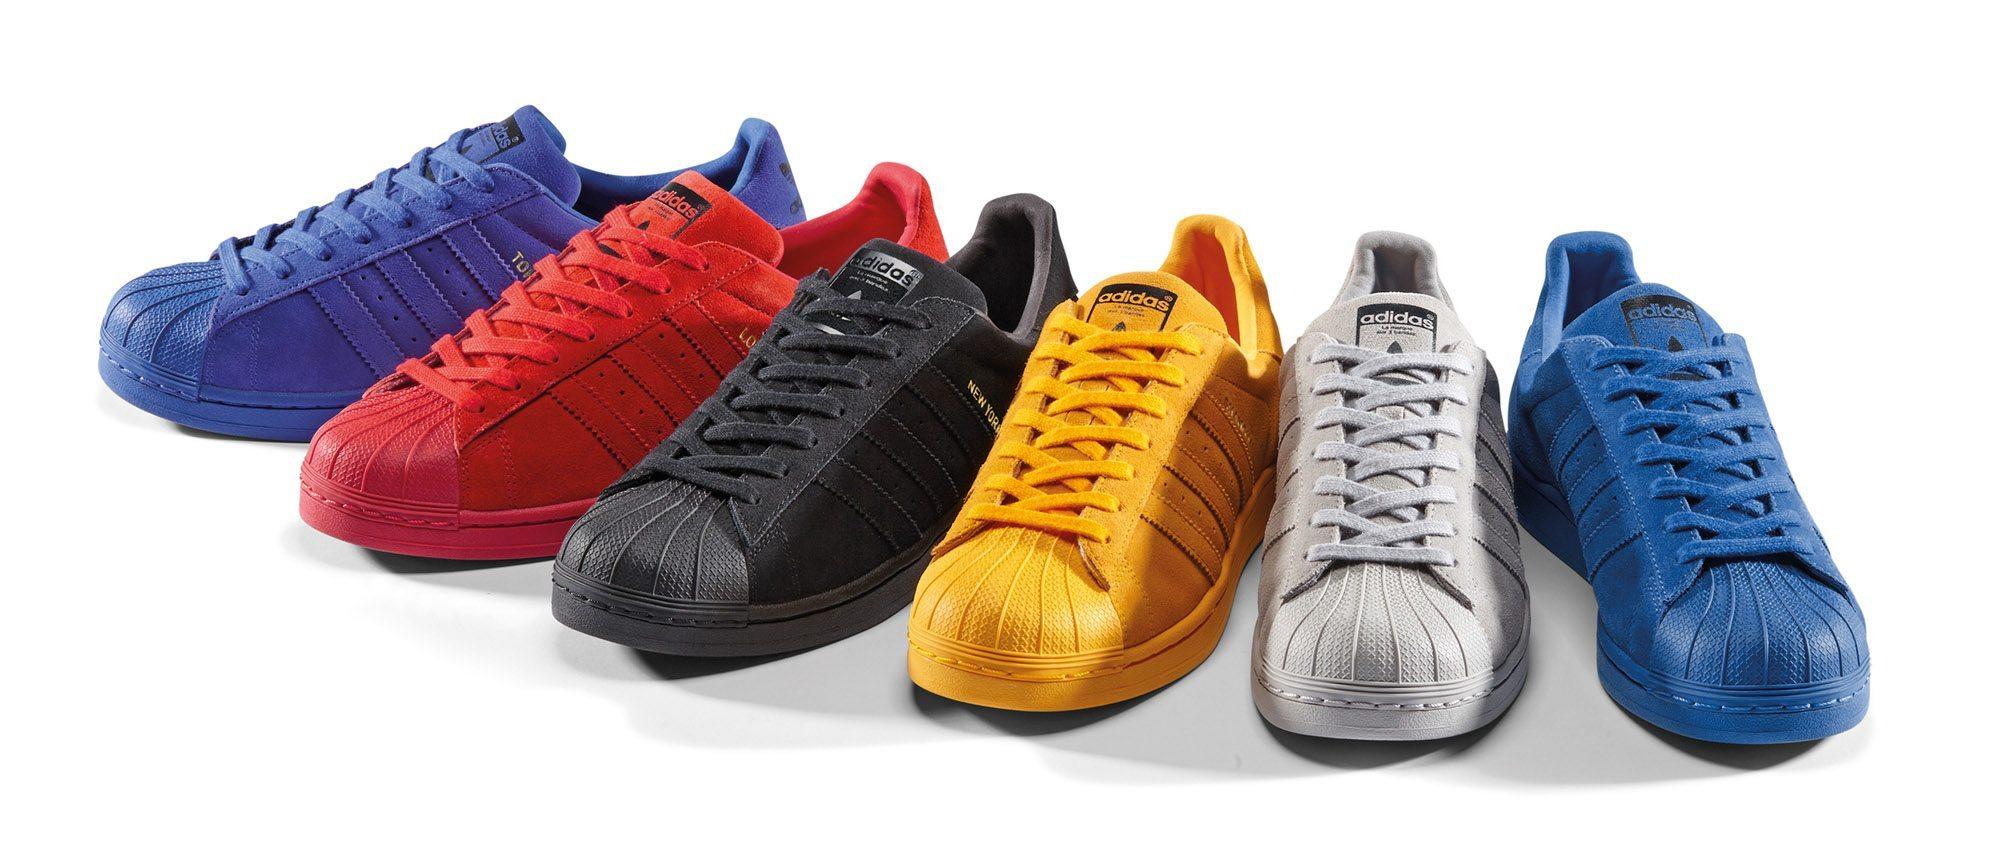 adidas Originals Superstar 80s City Series 1